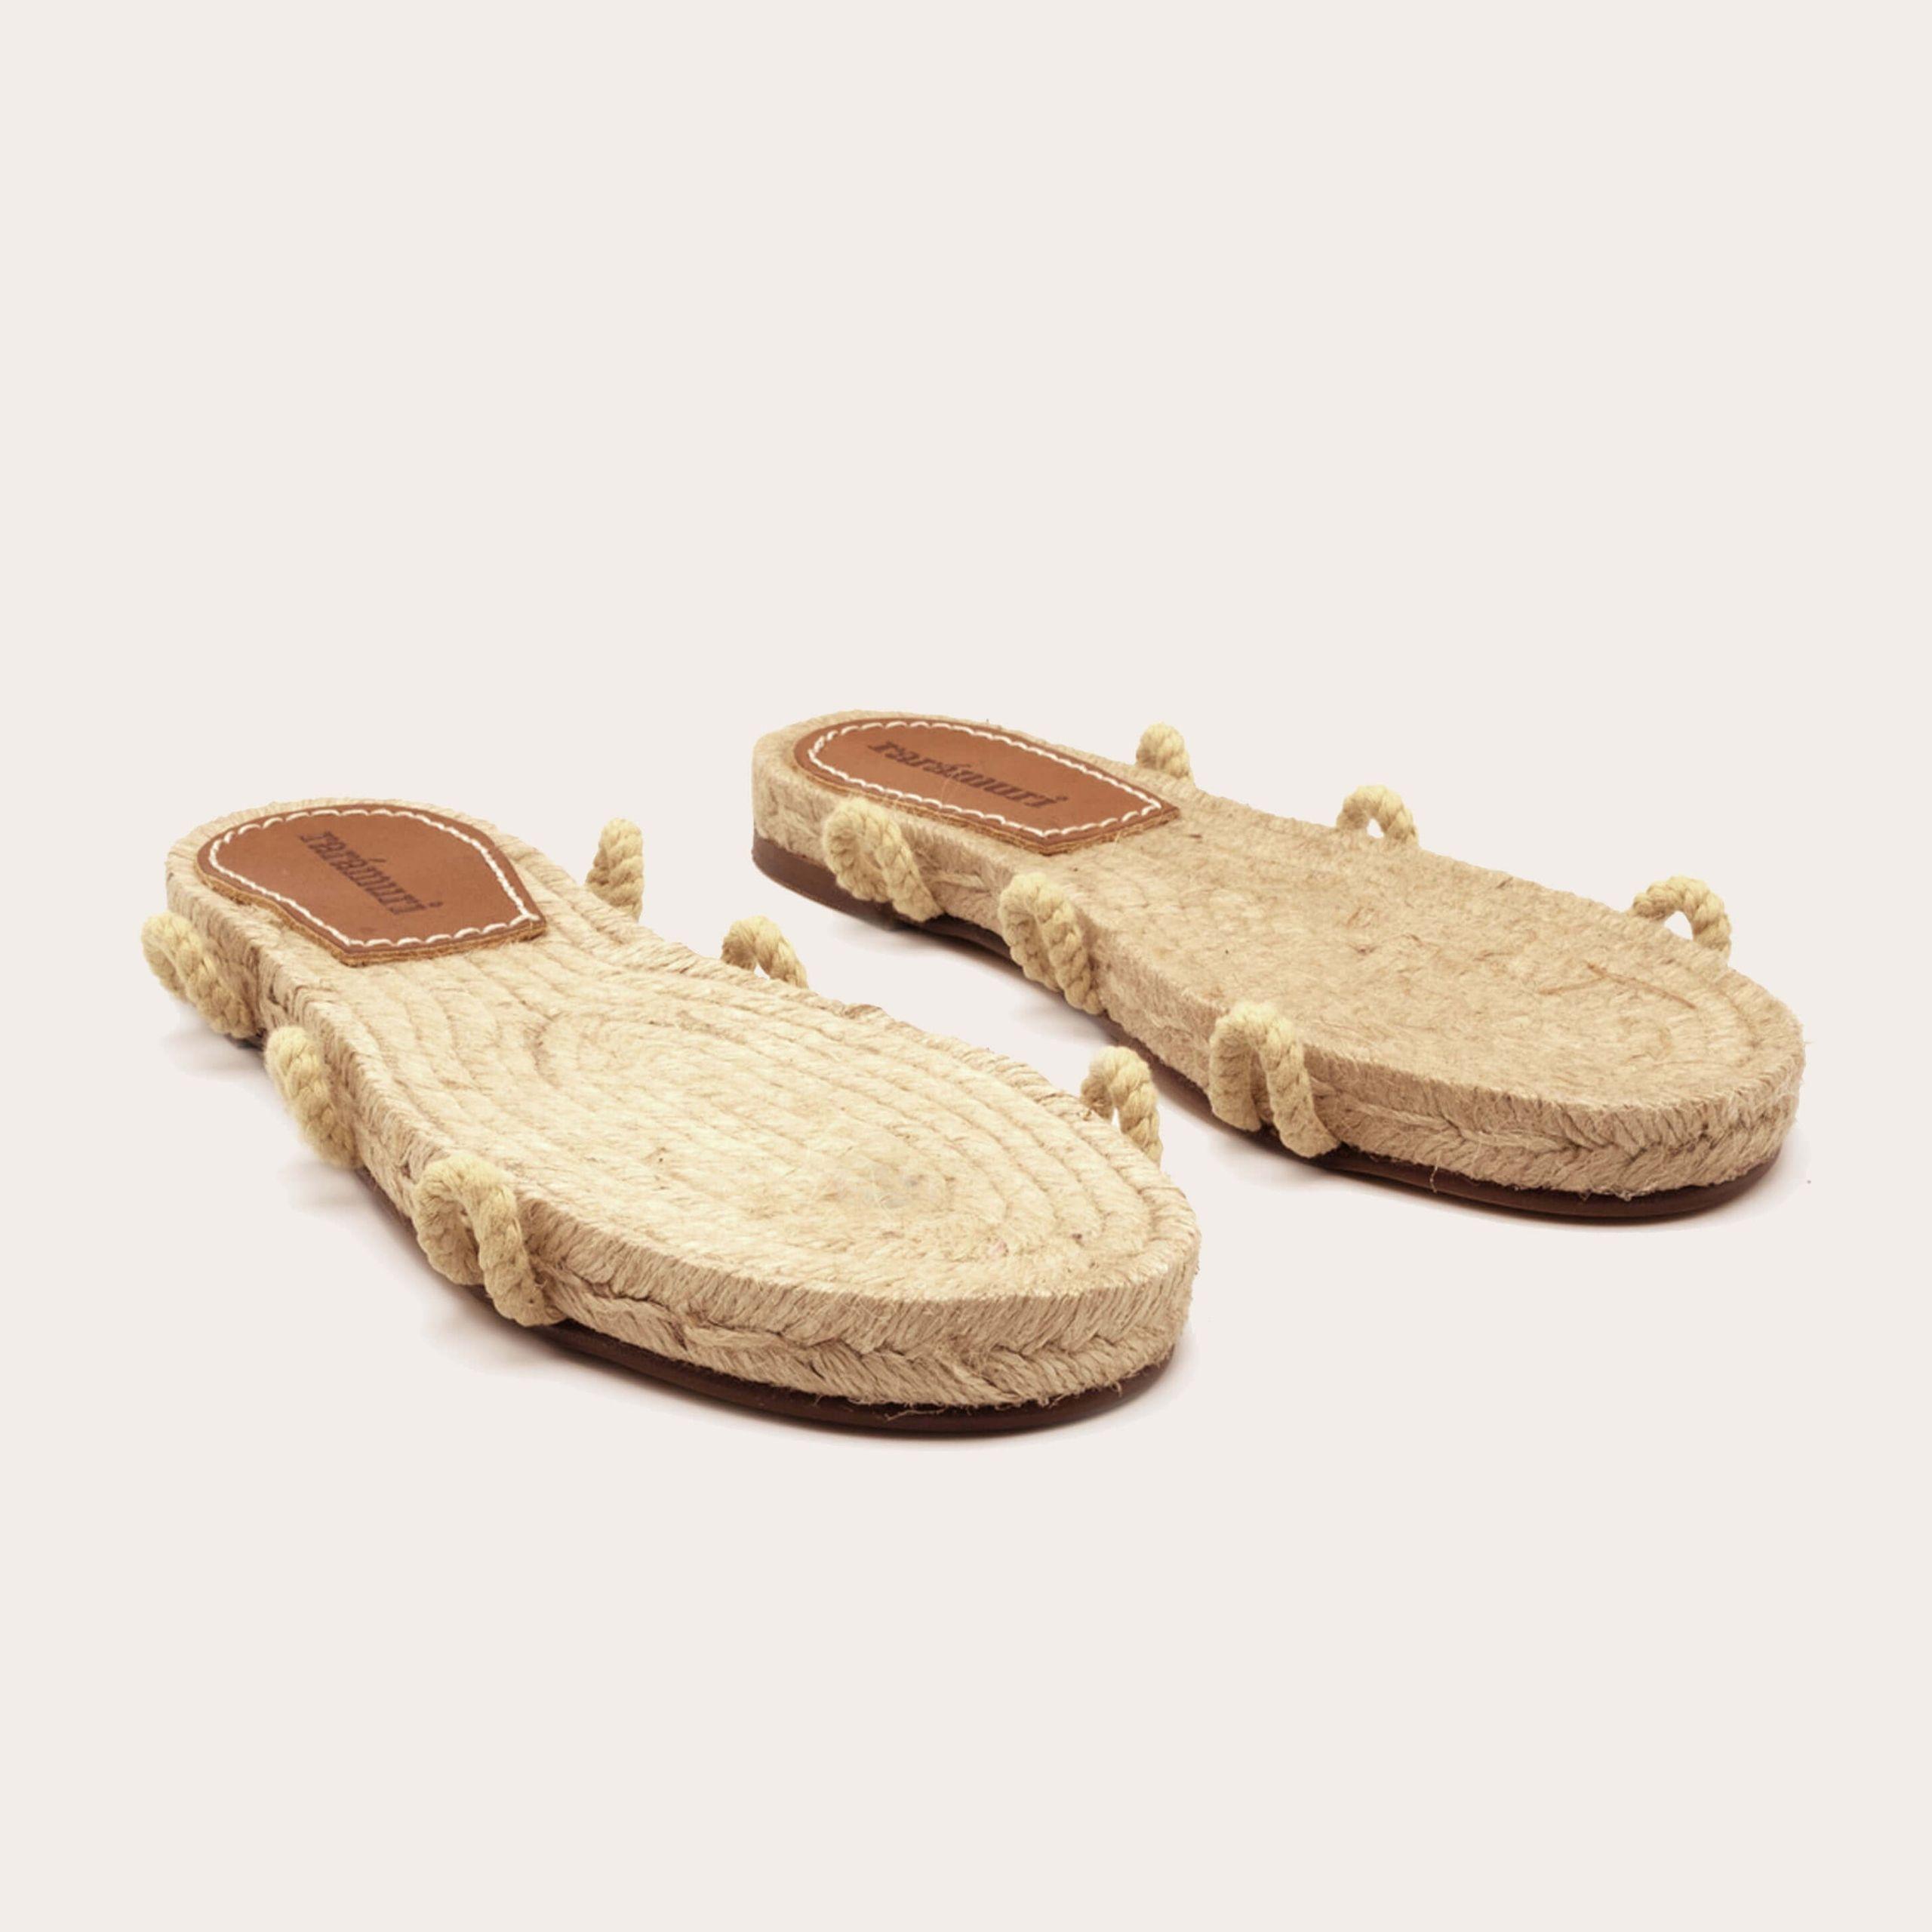 cruz-low_2_lintsandalen sandals travelsandals vegan sustainable sandals wikkelsandalen